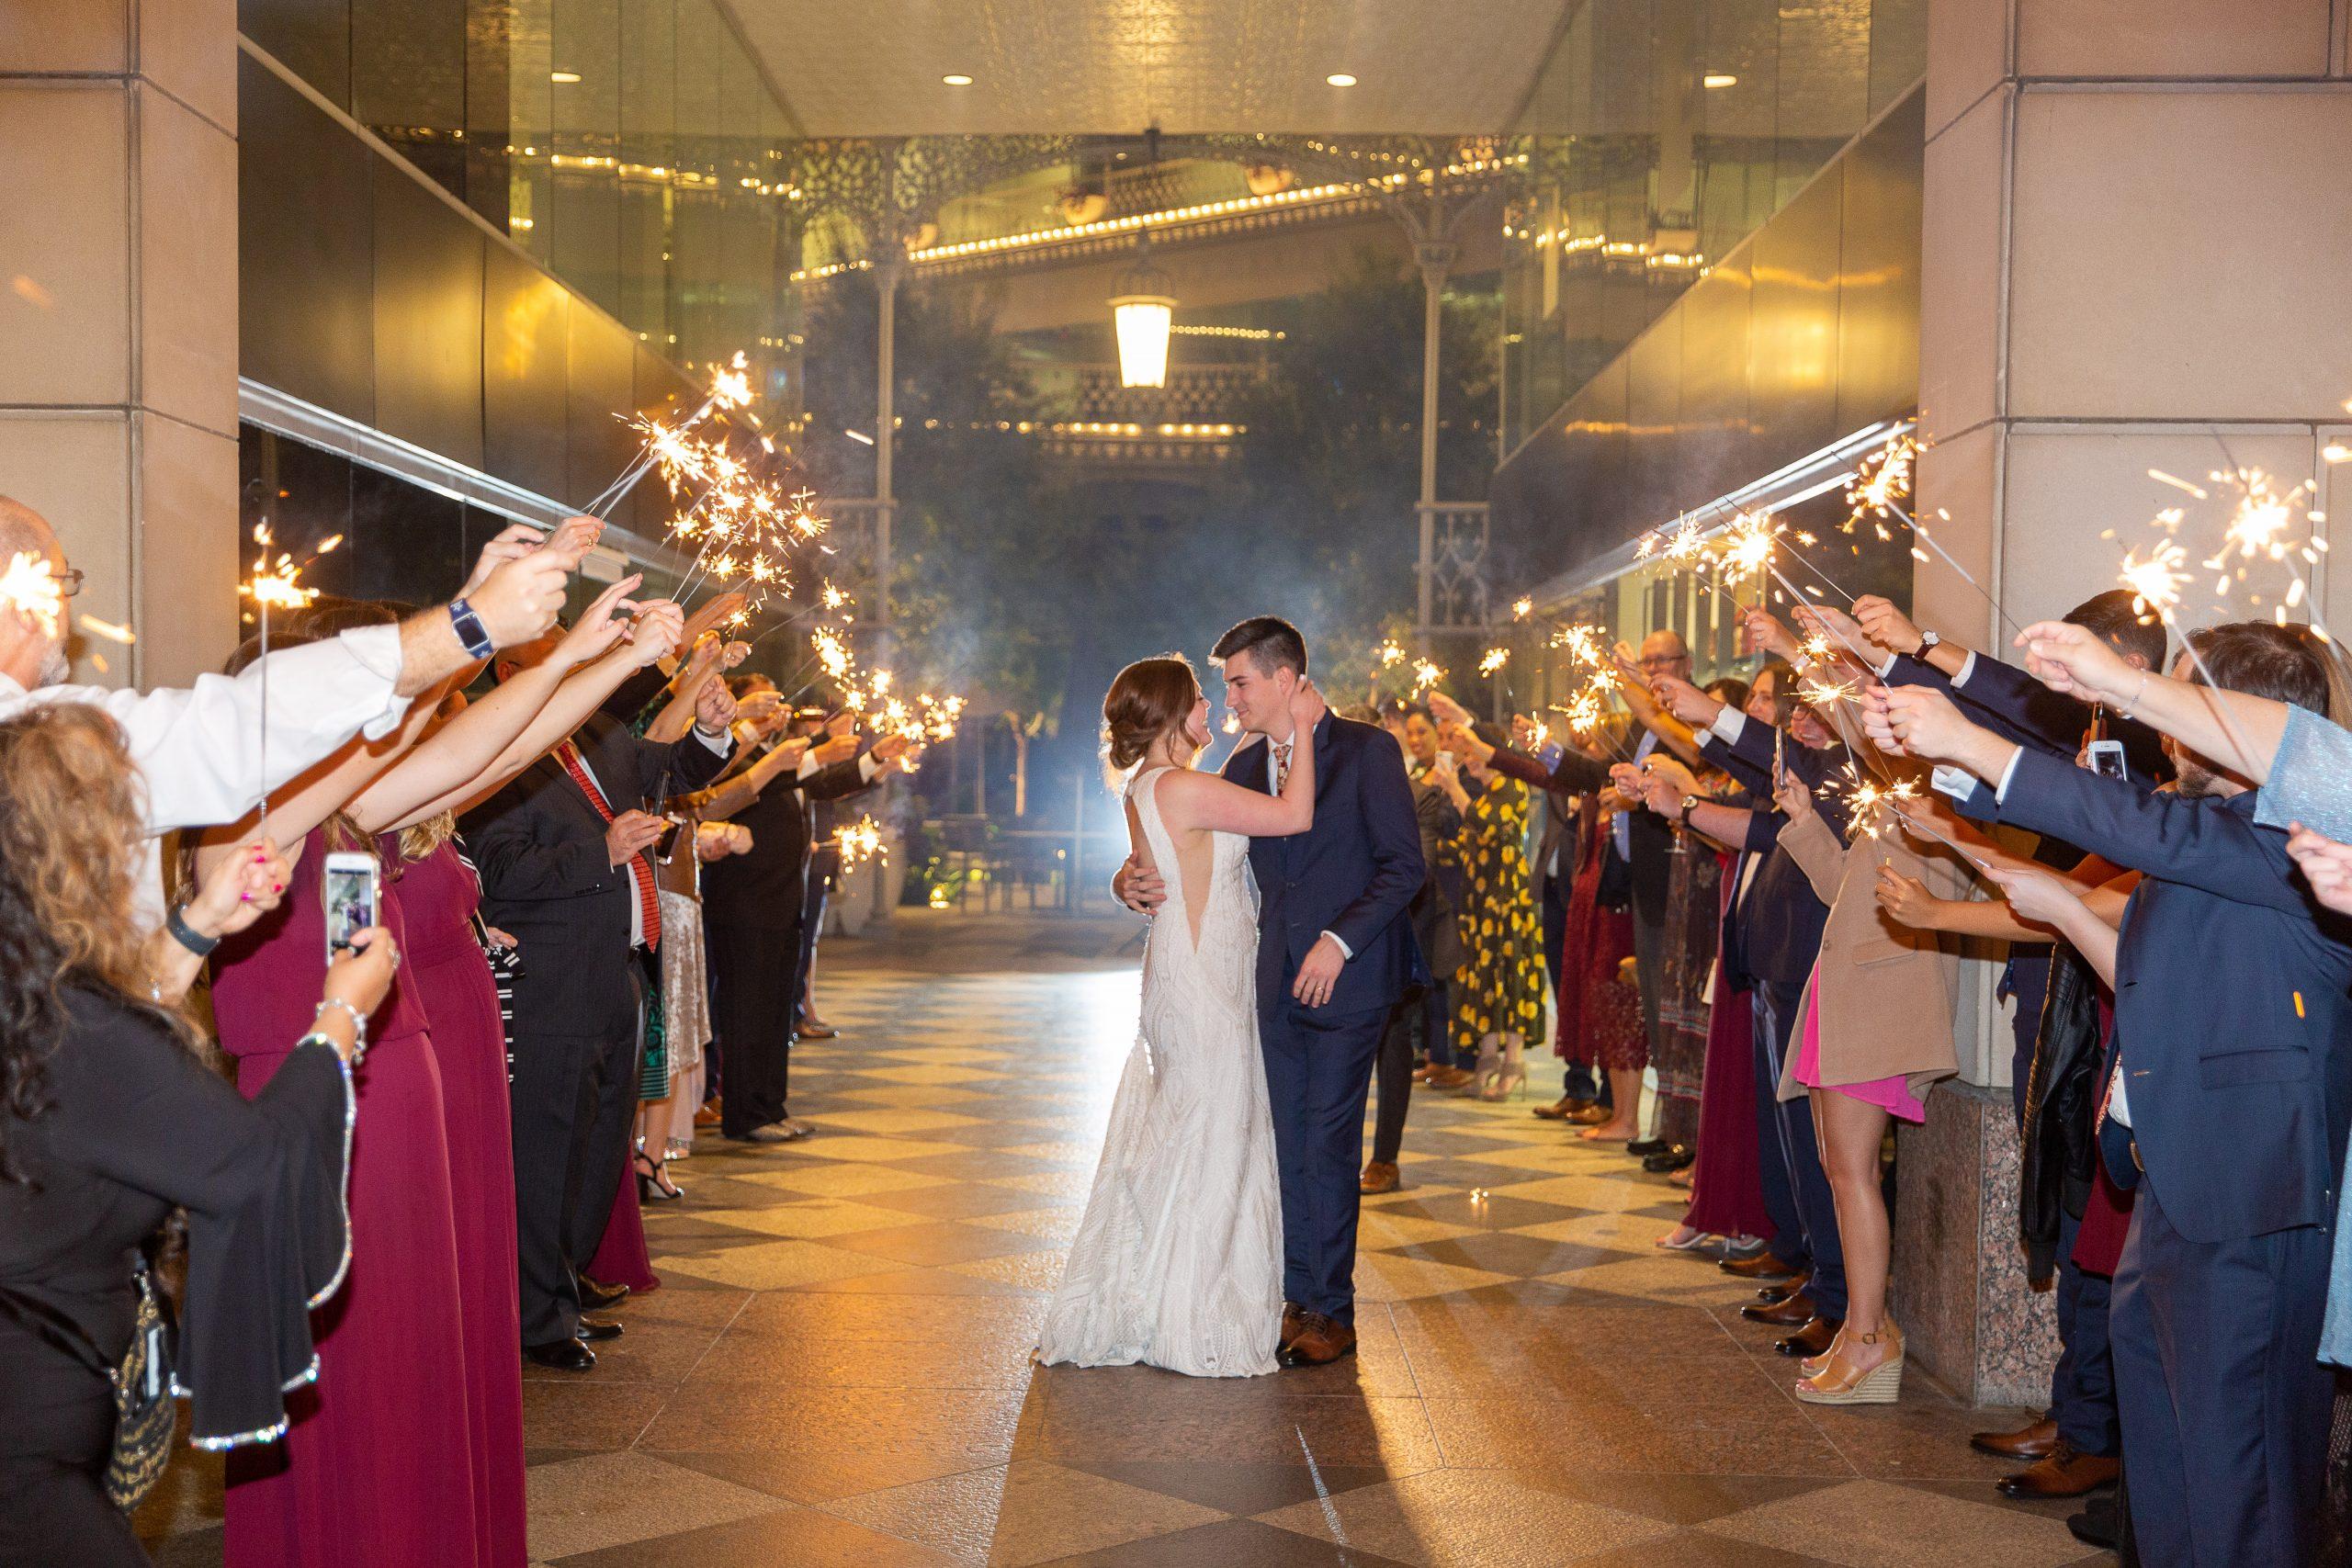 Kiley Wedding - DCM Photo - Exit